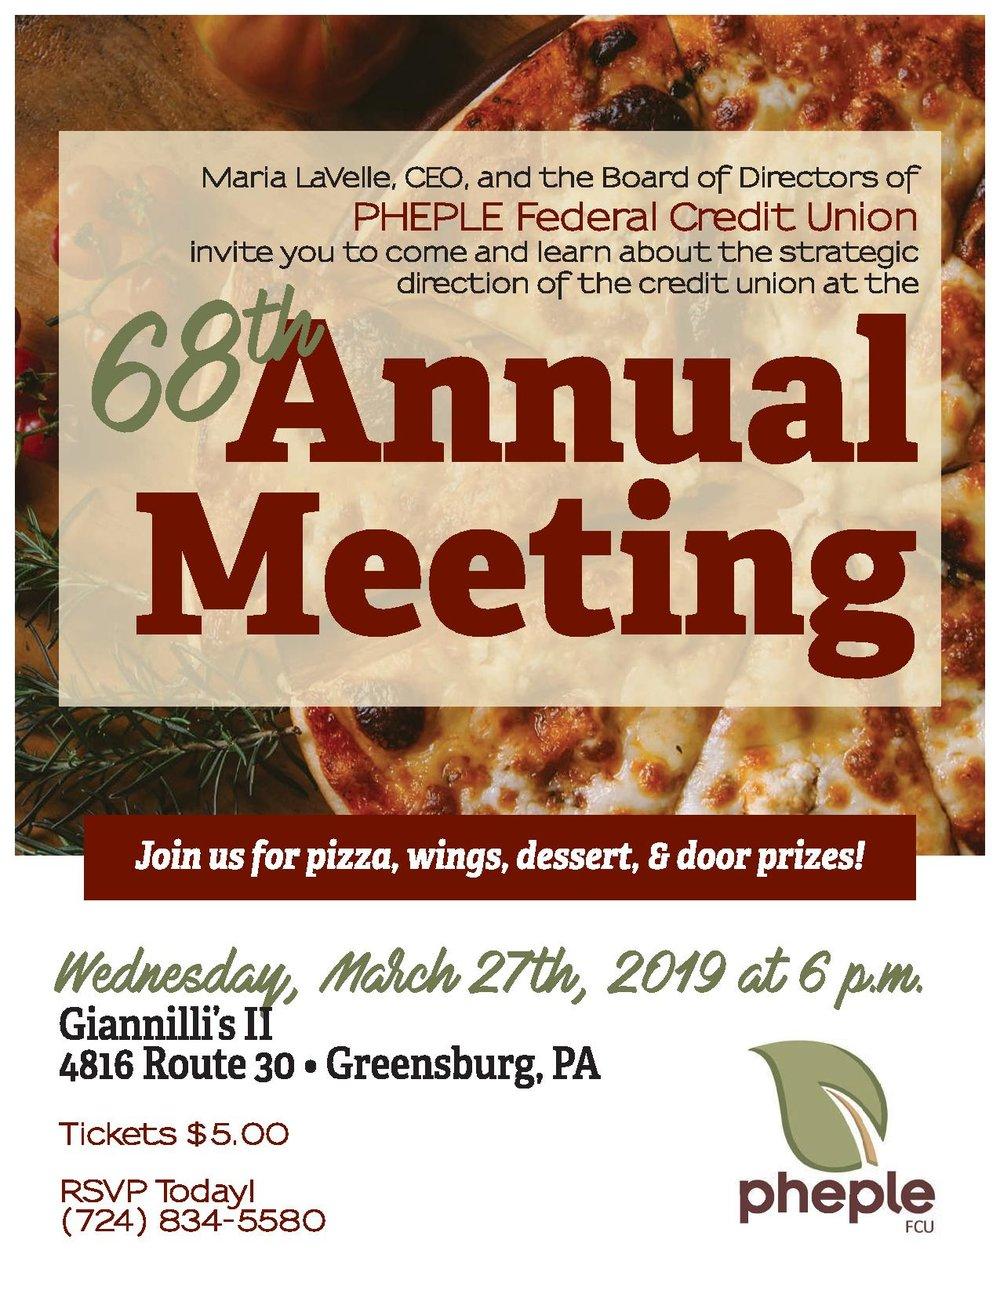 68th Annual Meeting Pheple FCU-page-001.jpg